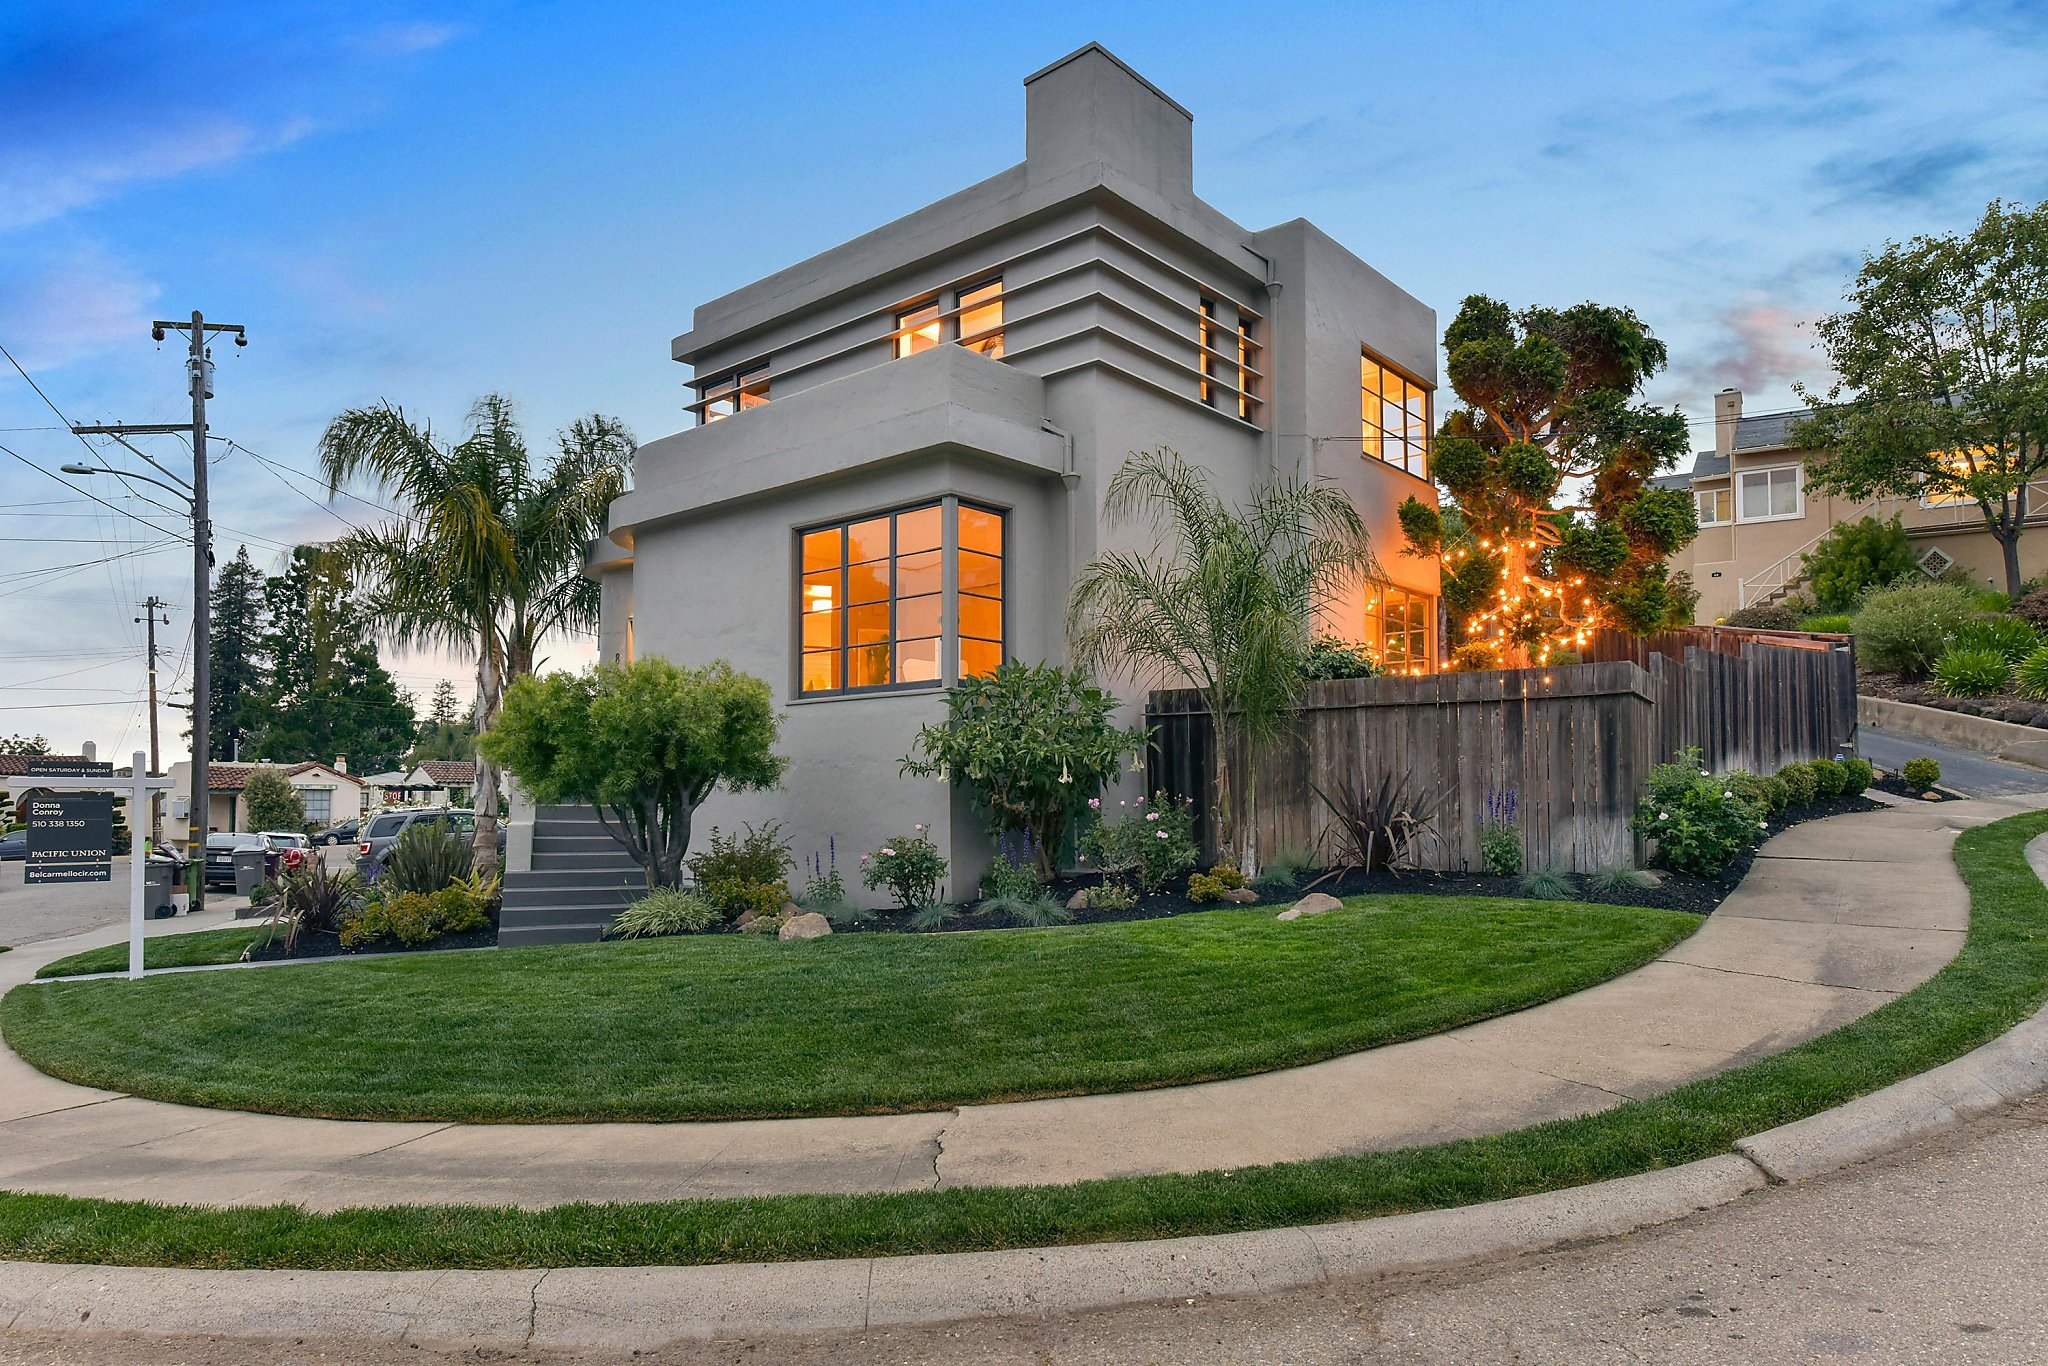 Art Deco Home Built In 1938 Open Sunday In Oakland